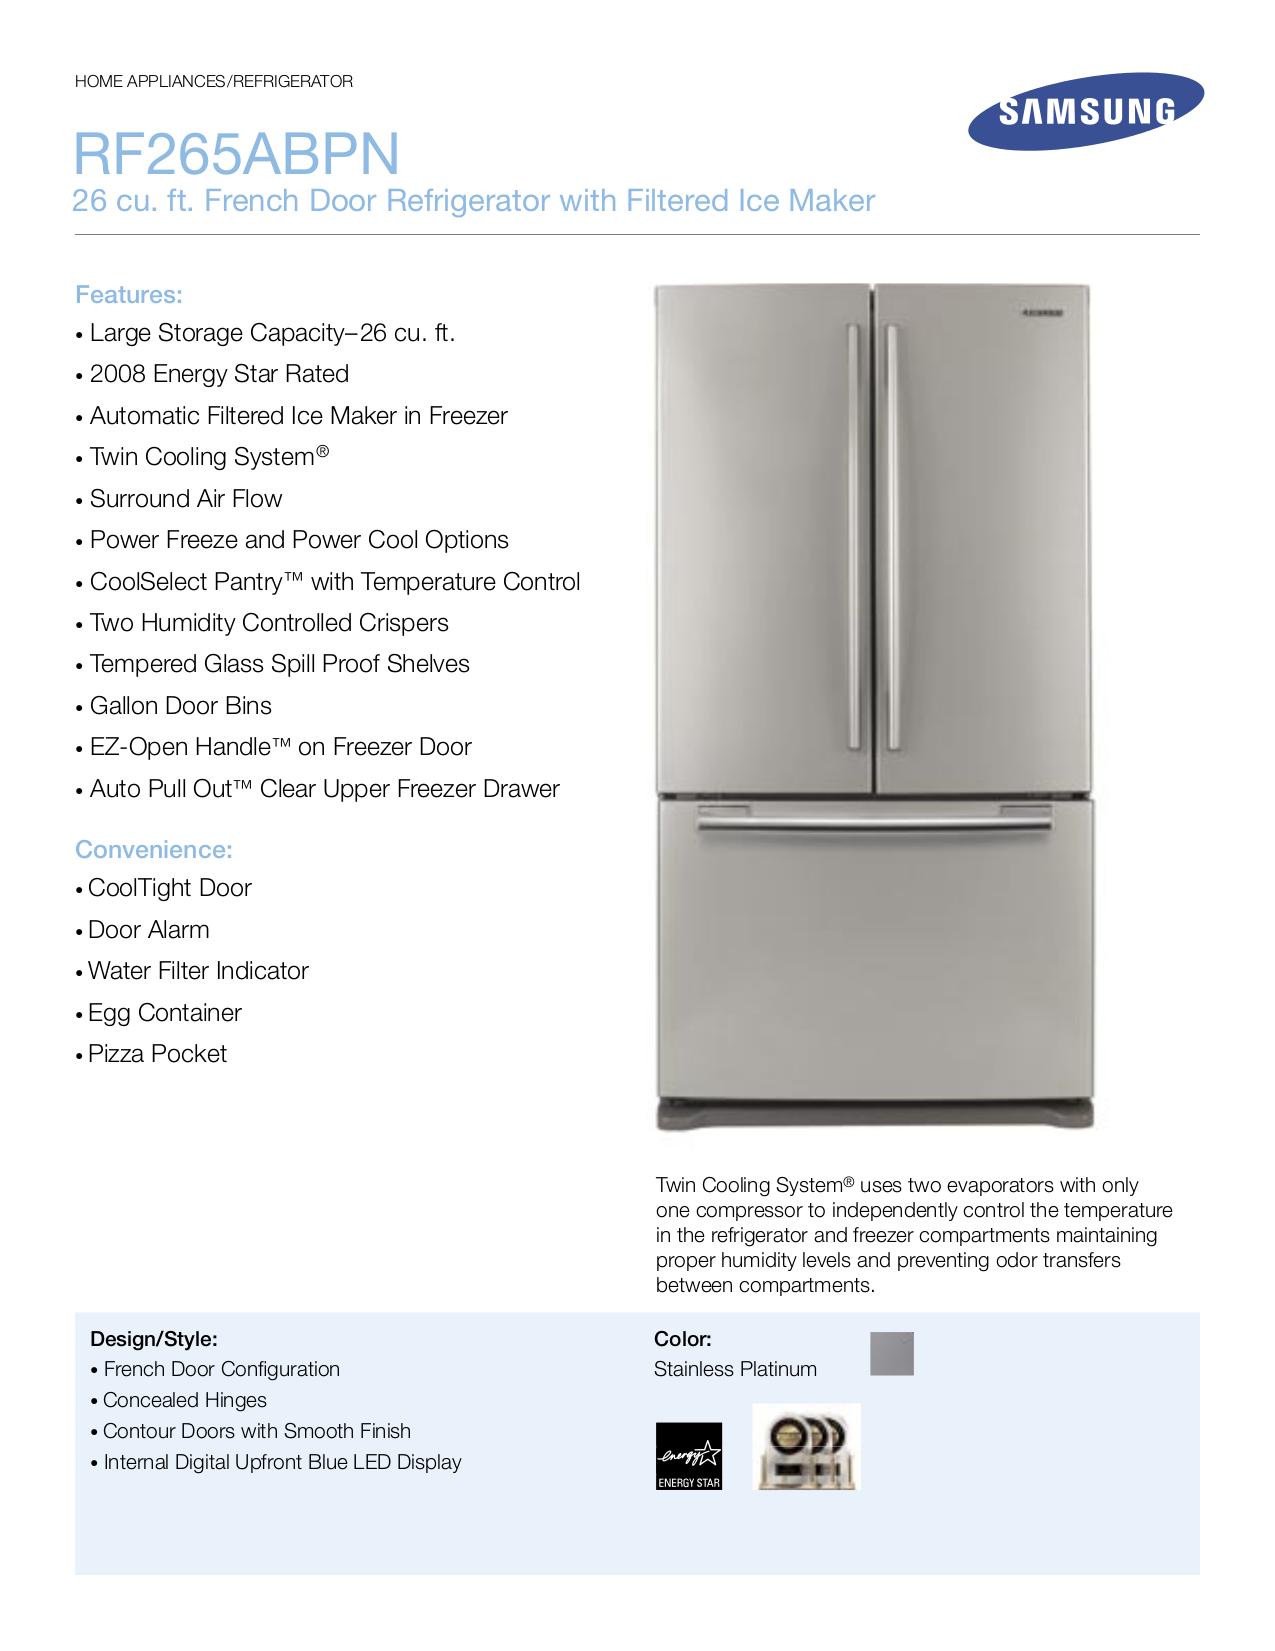 pdf for Samsung Refrigerator RF265ABPN manual